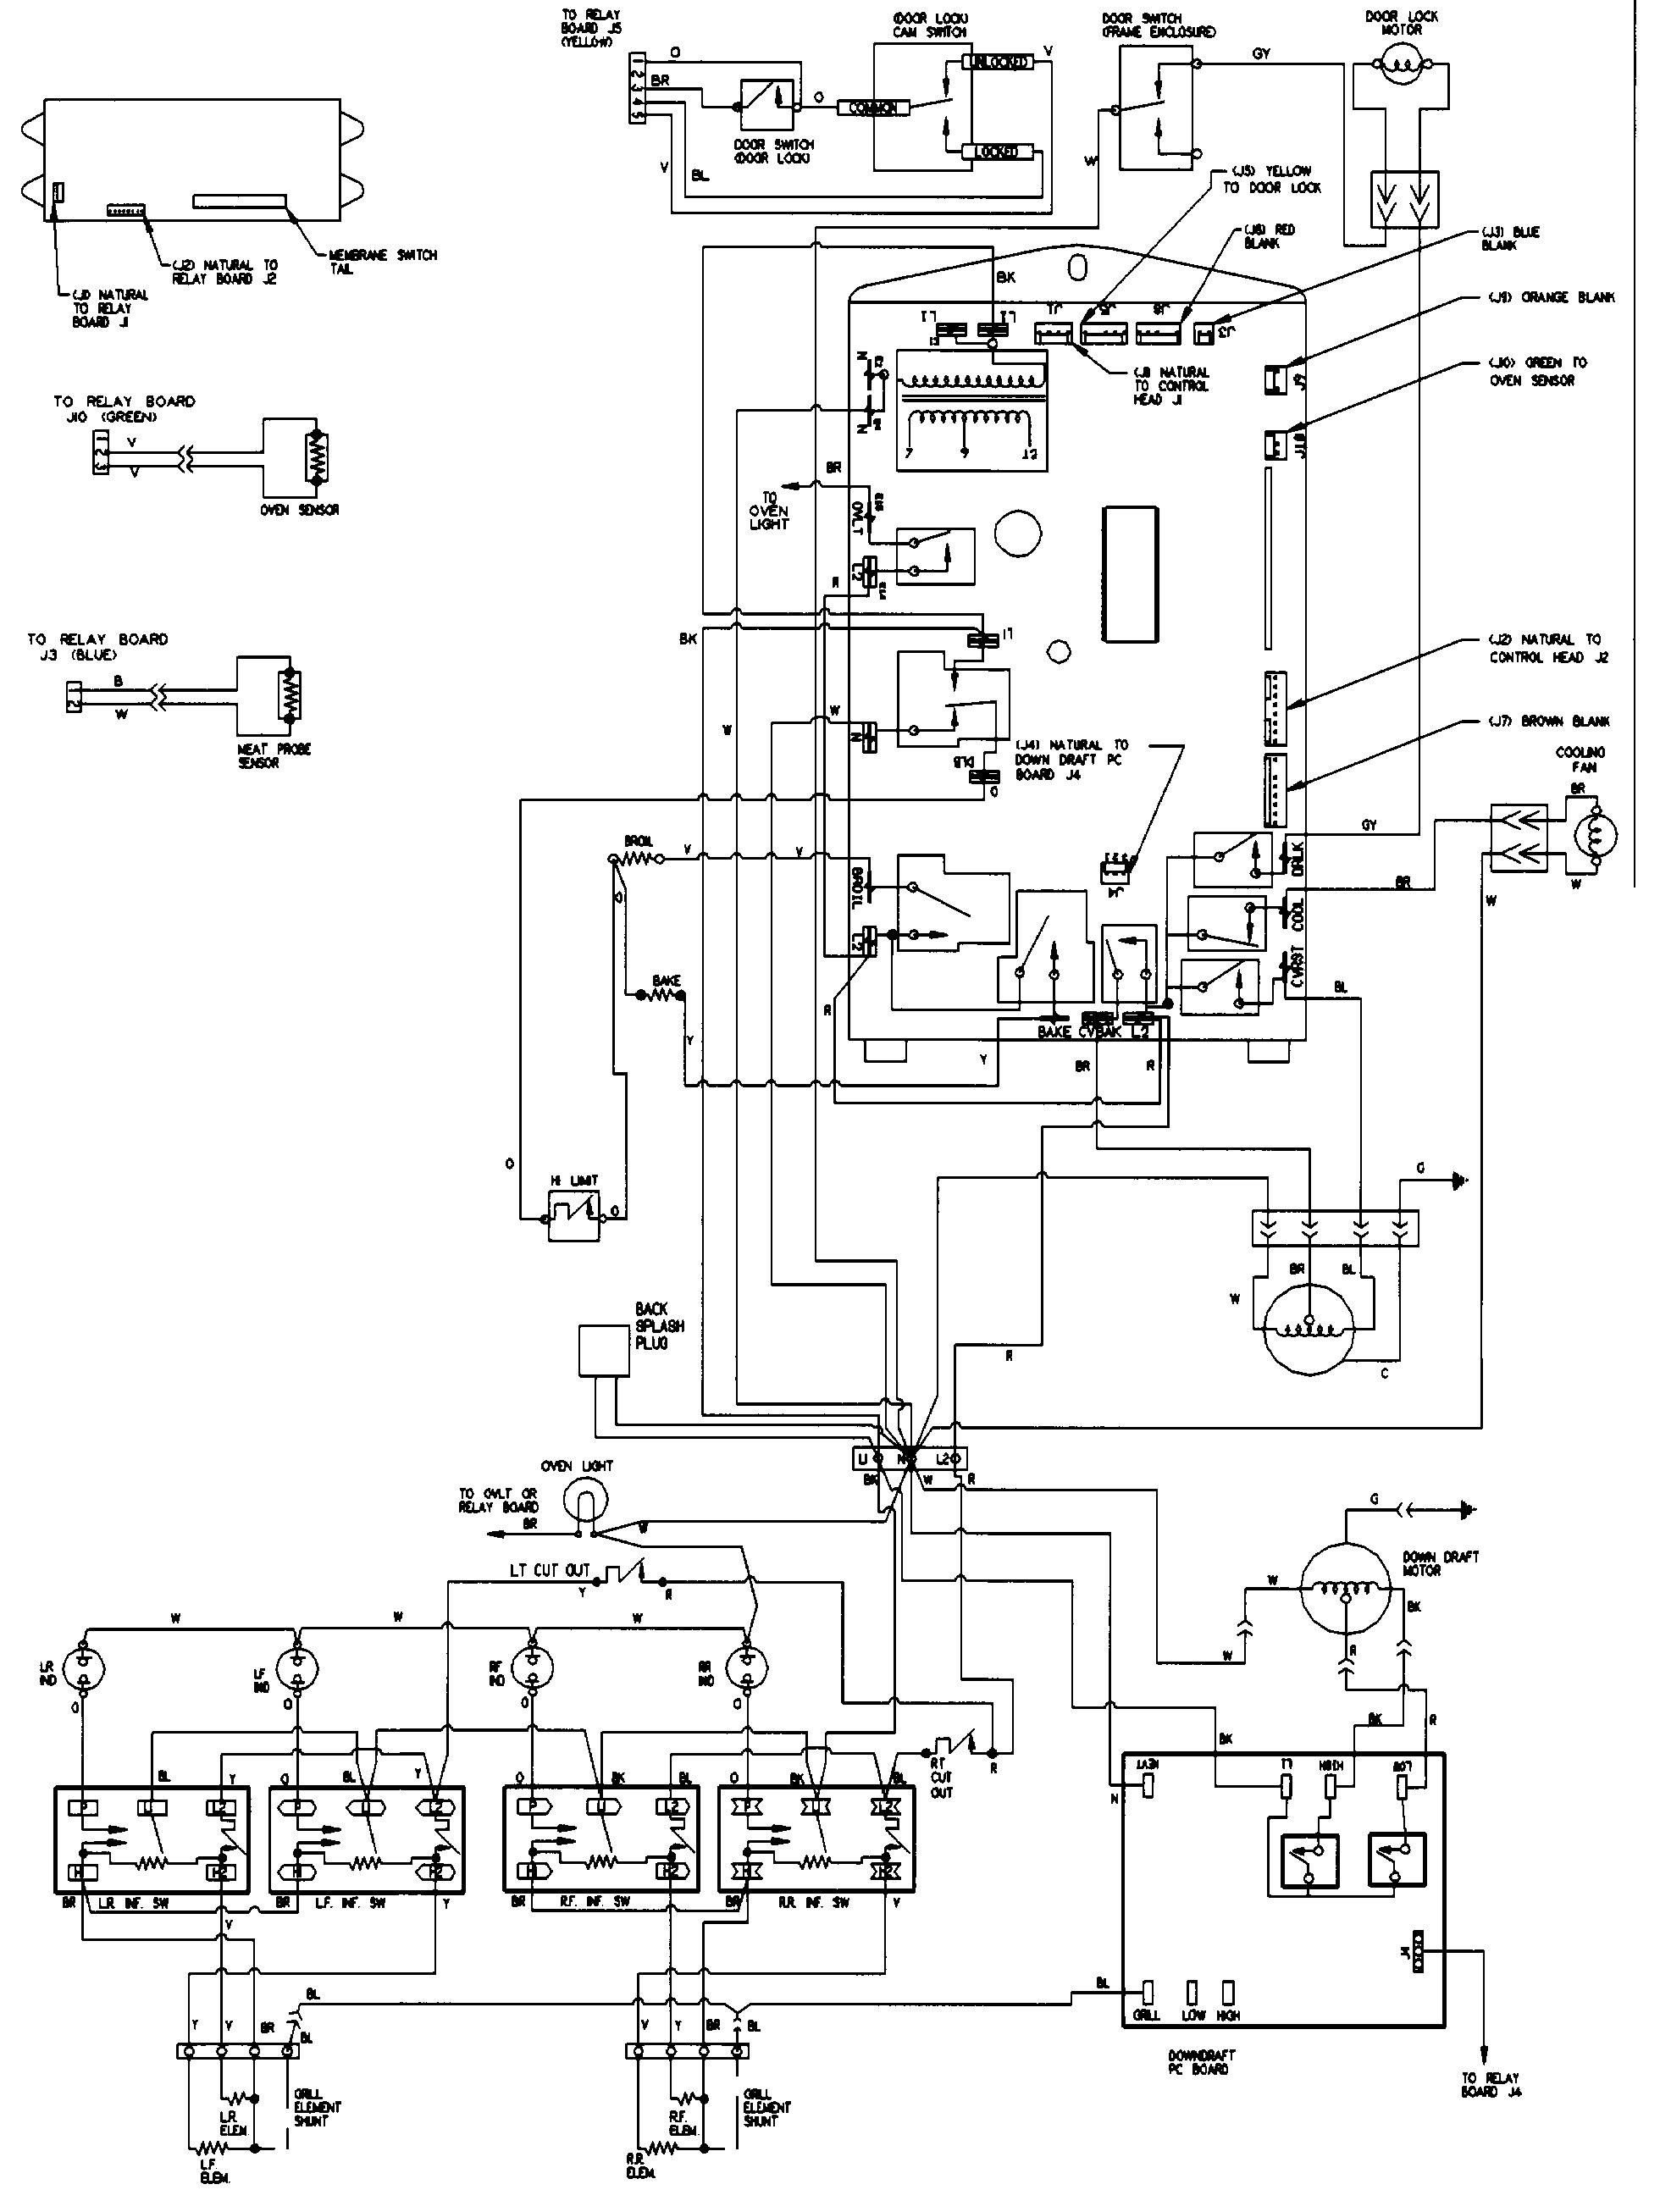 kitchenaid gas grill ignitor wiring diagram | wiring diagram – grill  ignitor wiring diagram